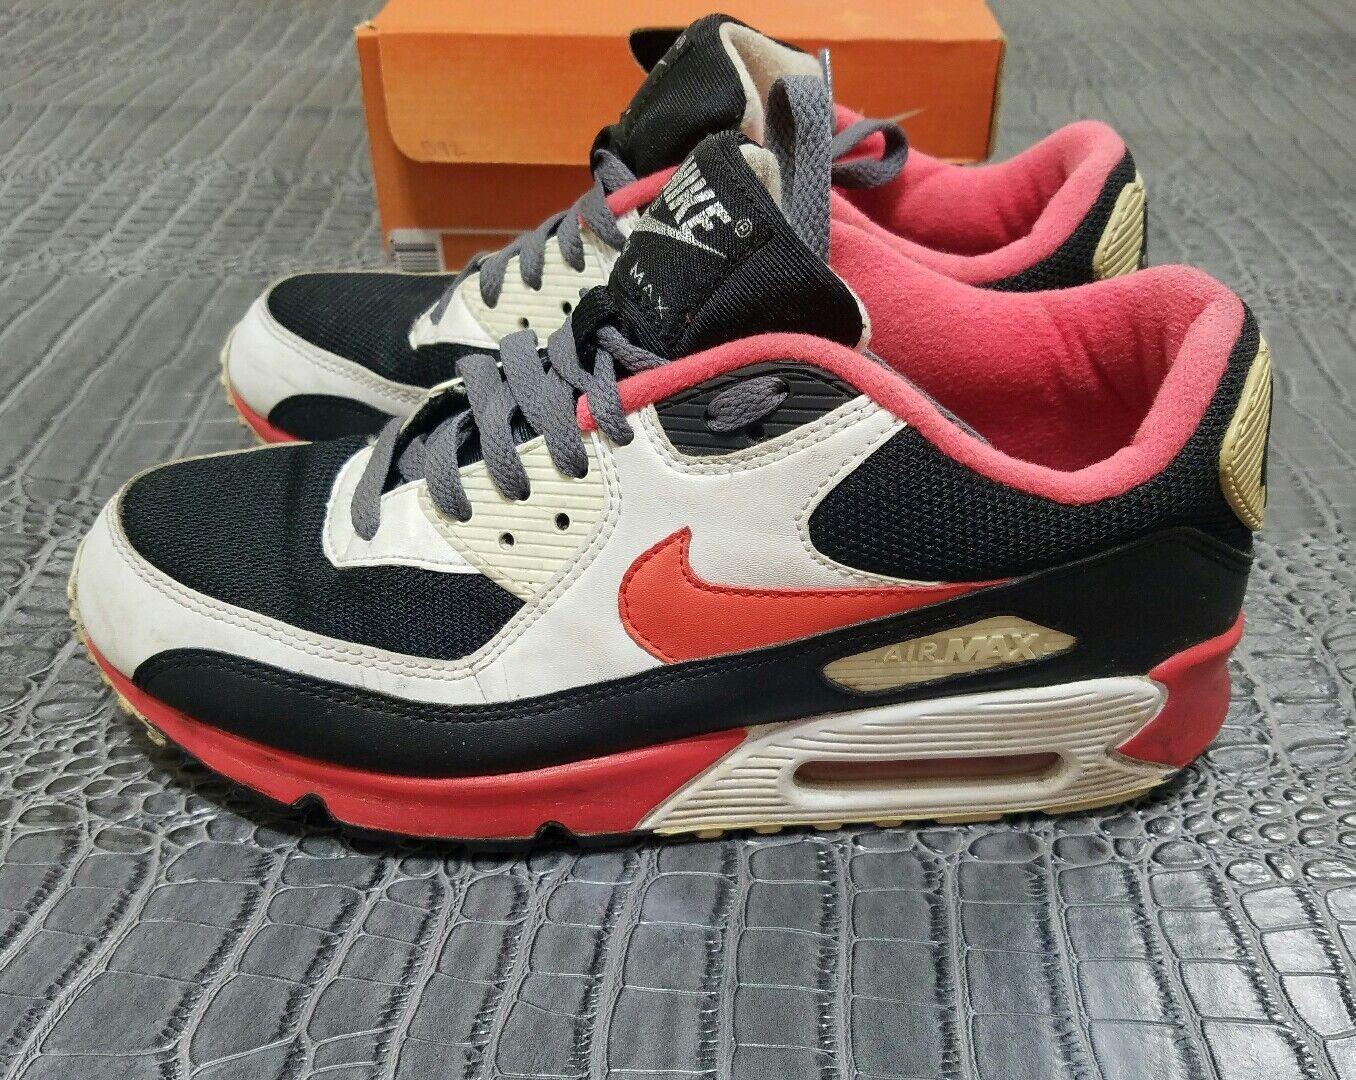 ID de Nike Air Max 90 negro raras negro 90 varsity rojo 314266-991 comodo 124333